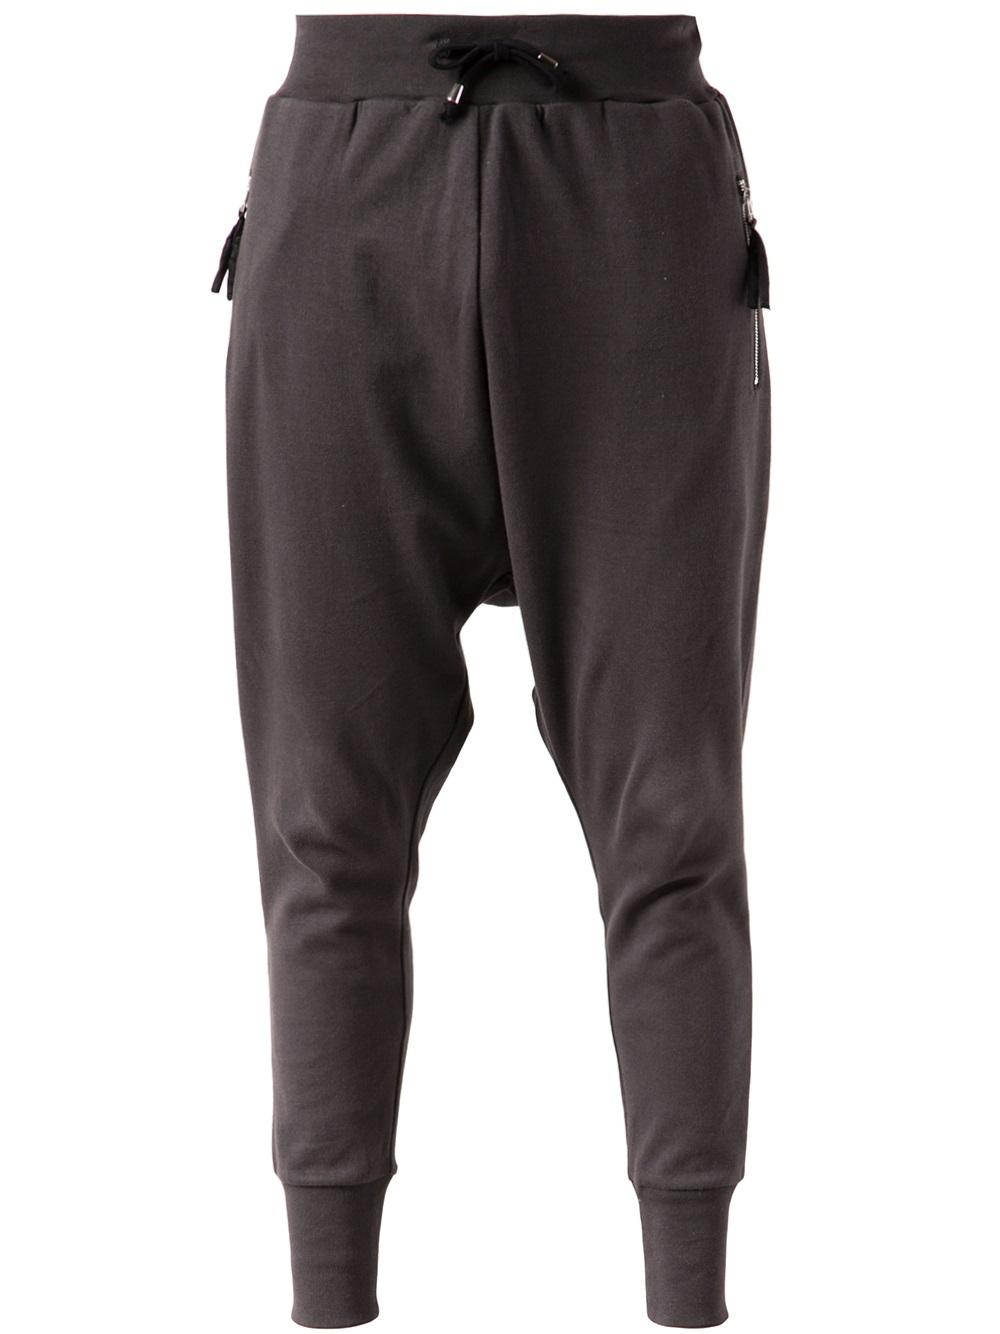 Wonderful EMP Industrial  Hard Tail  Womens  Slouchy Drop Crotch Pant